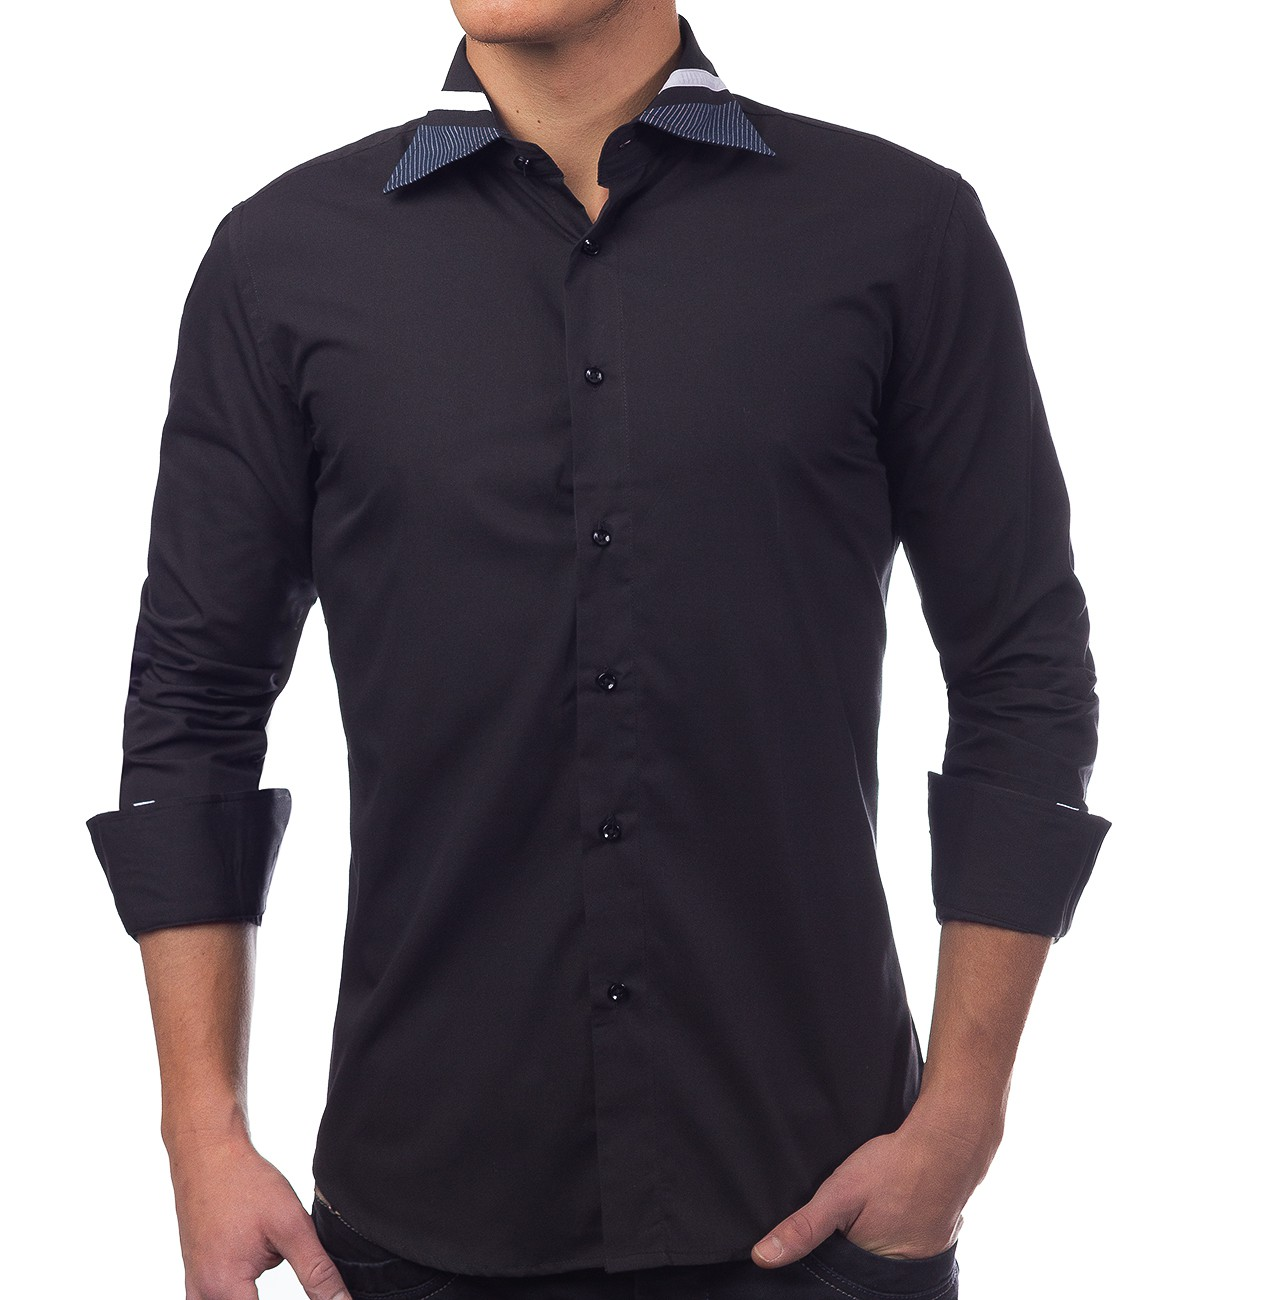 herren hemd langarm poloshirt slim fit freizeithemd casual. Black Bedroom Furniture Sets. Home Design Ideas